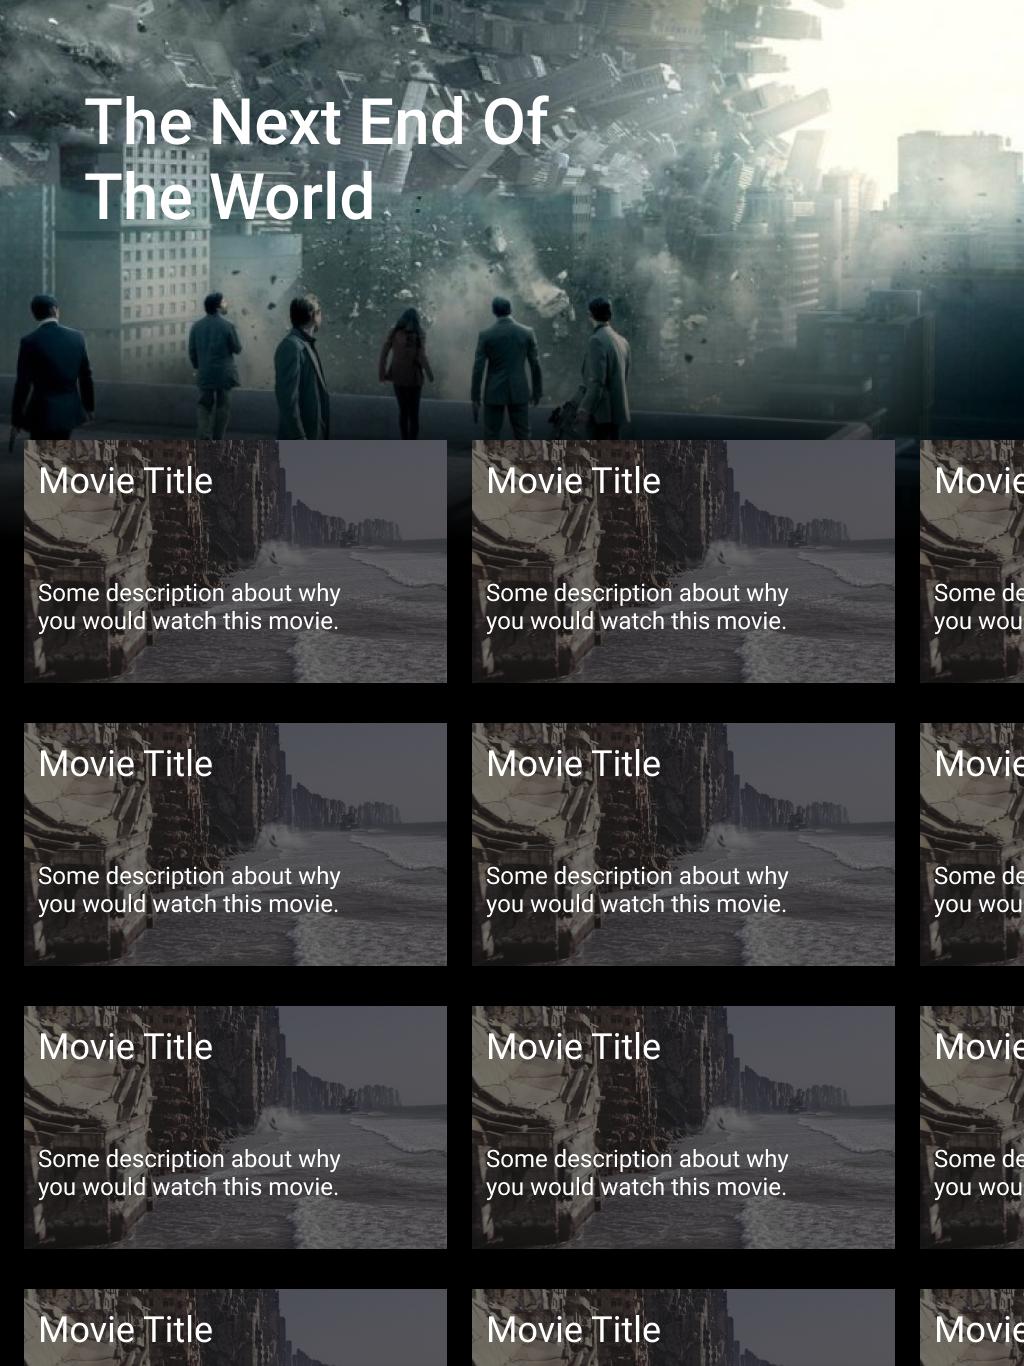 Movies Lander on a Tablet